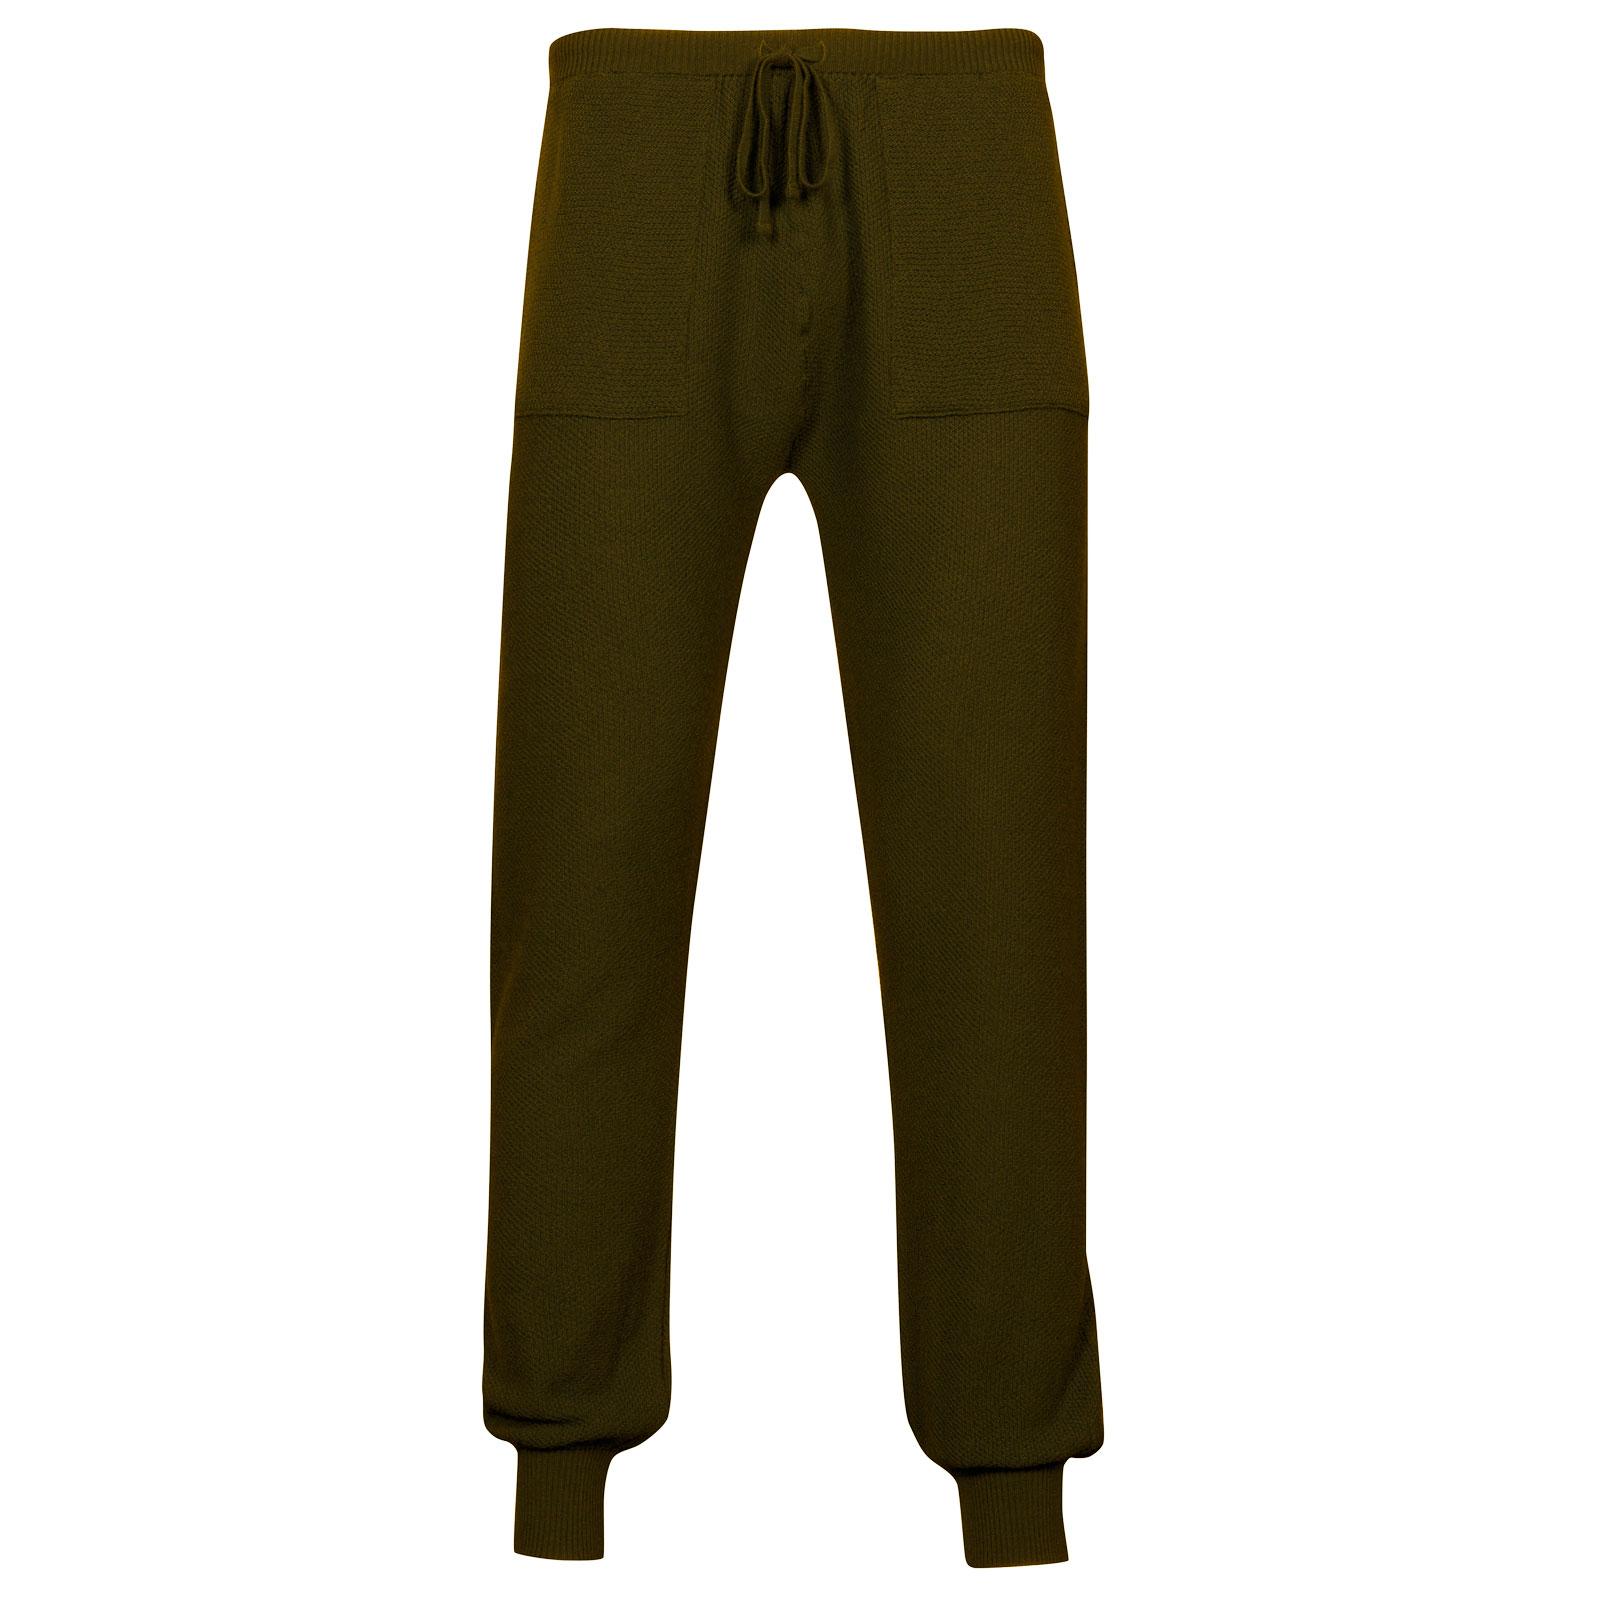 John Smedley 5Singular Merino Wool Trouser in Khaki-XXL